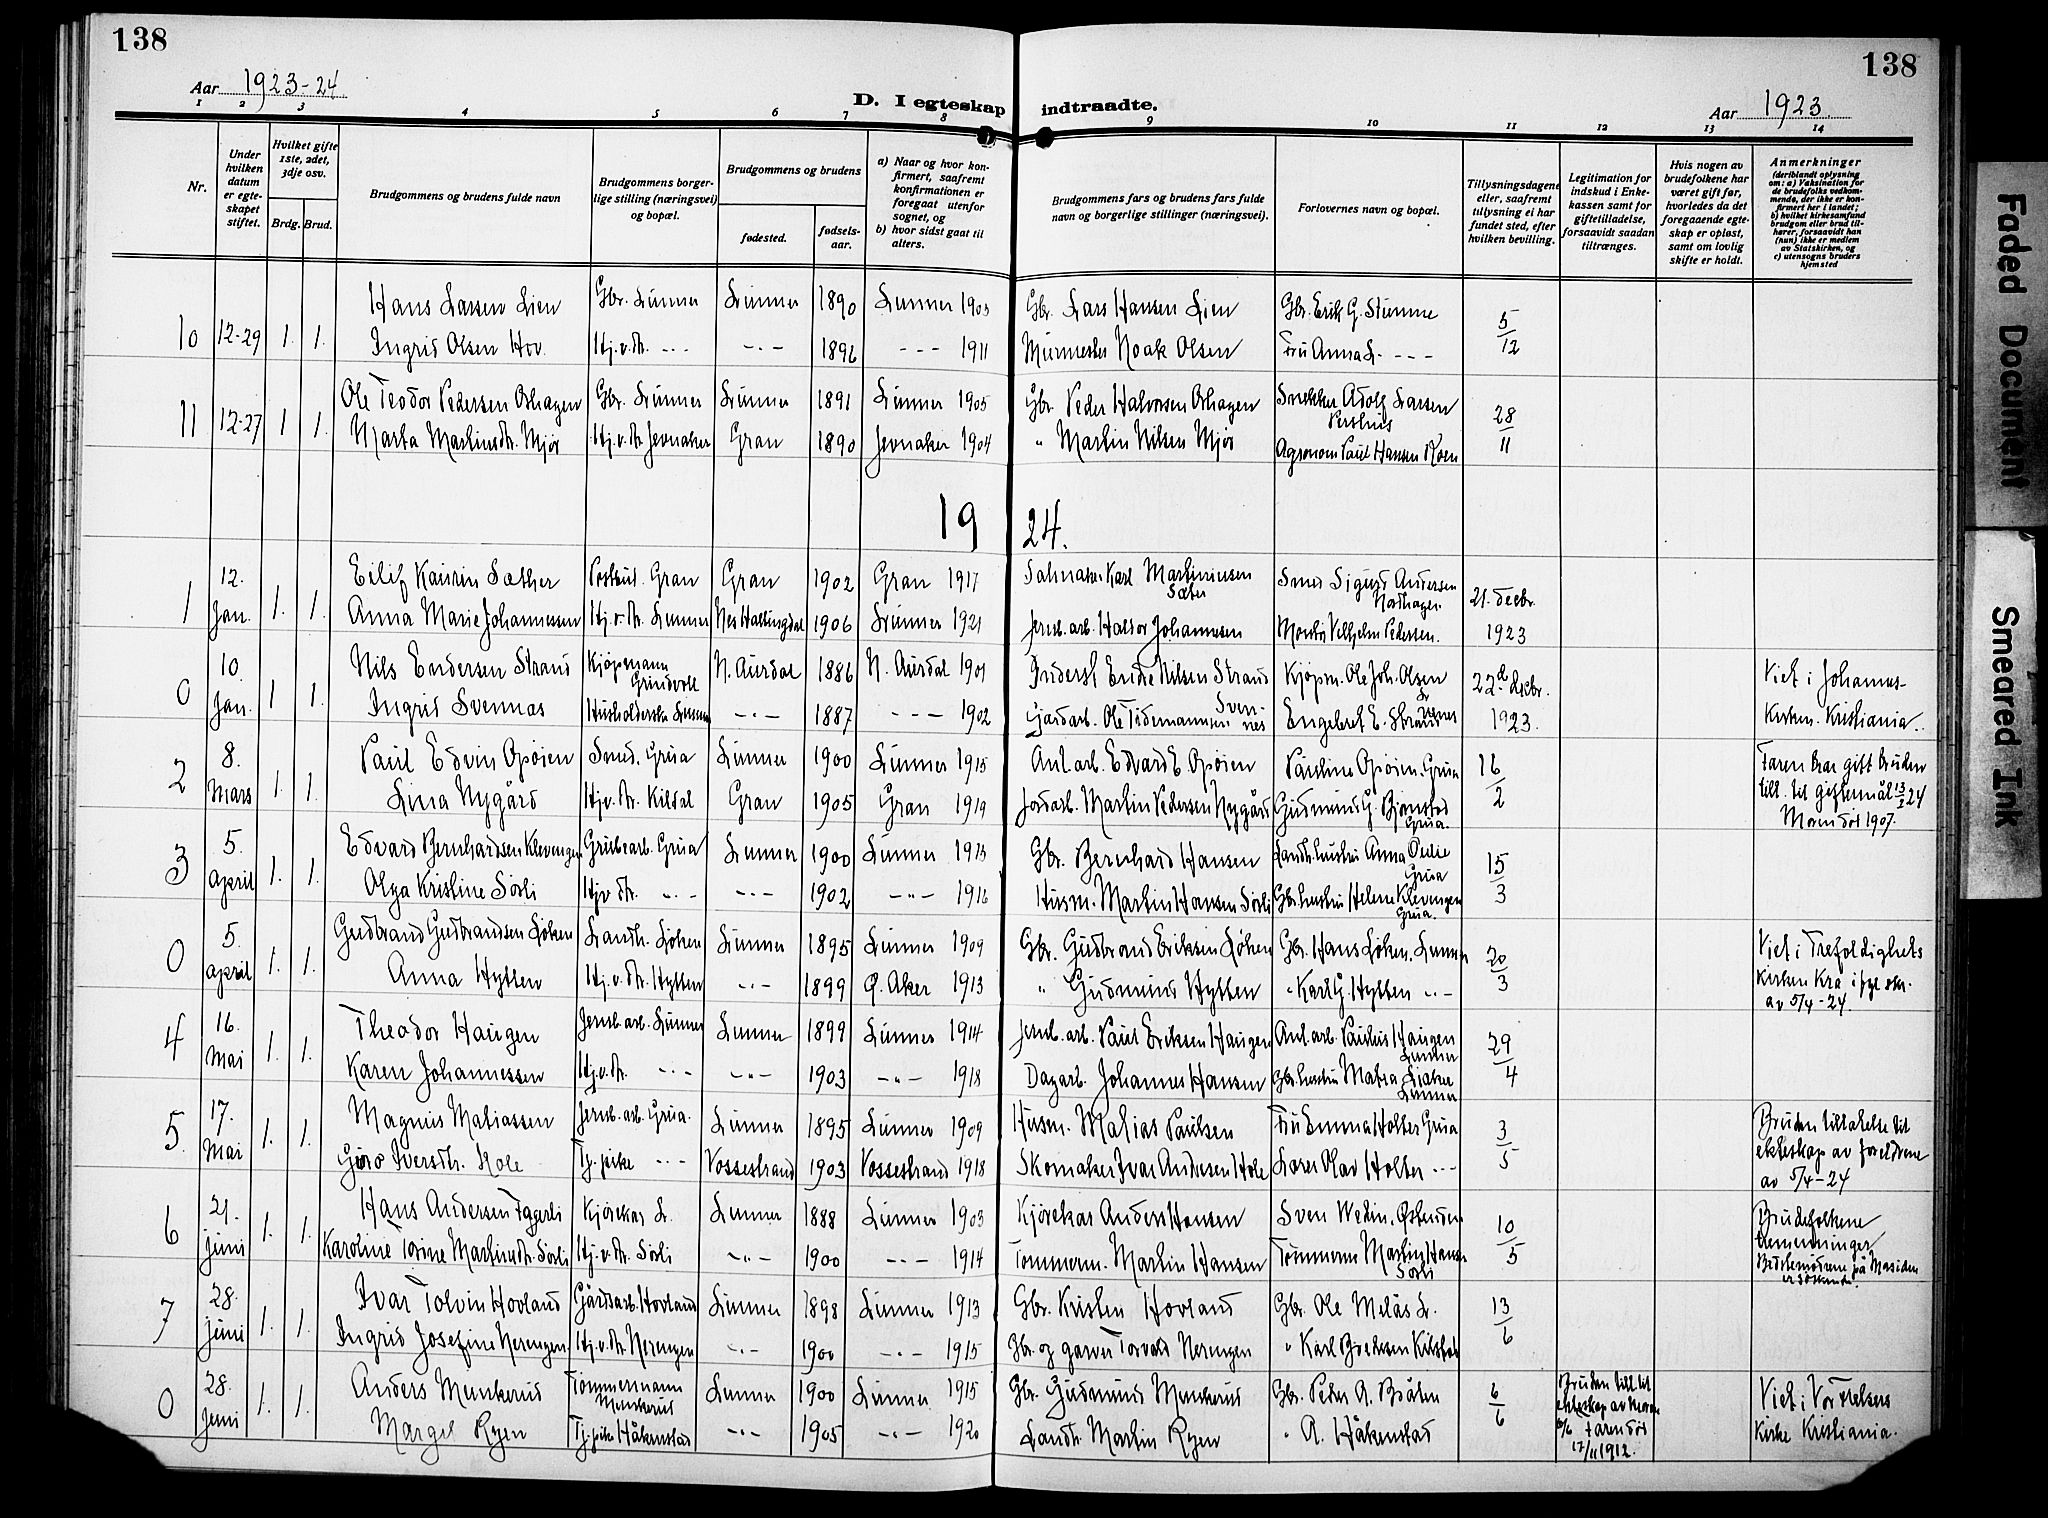 SAH, Lunner prestekontor, H/Ha/Hab/L0002: Klokkerbok nr. 2, 1923-1933, s. 138